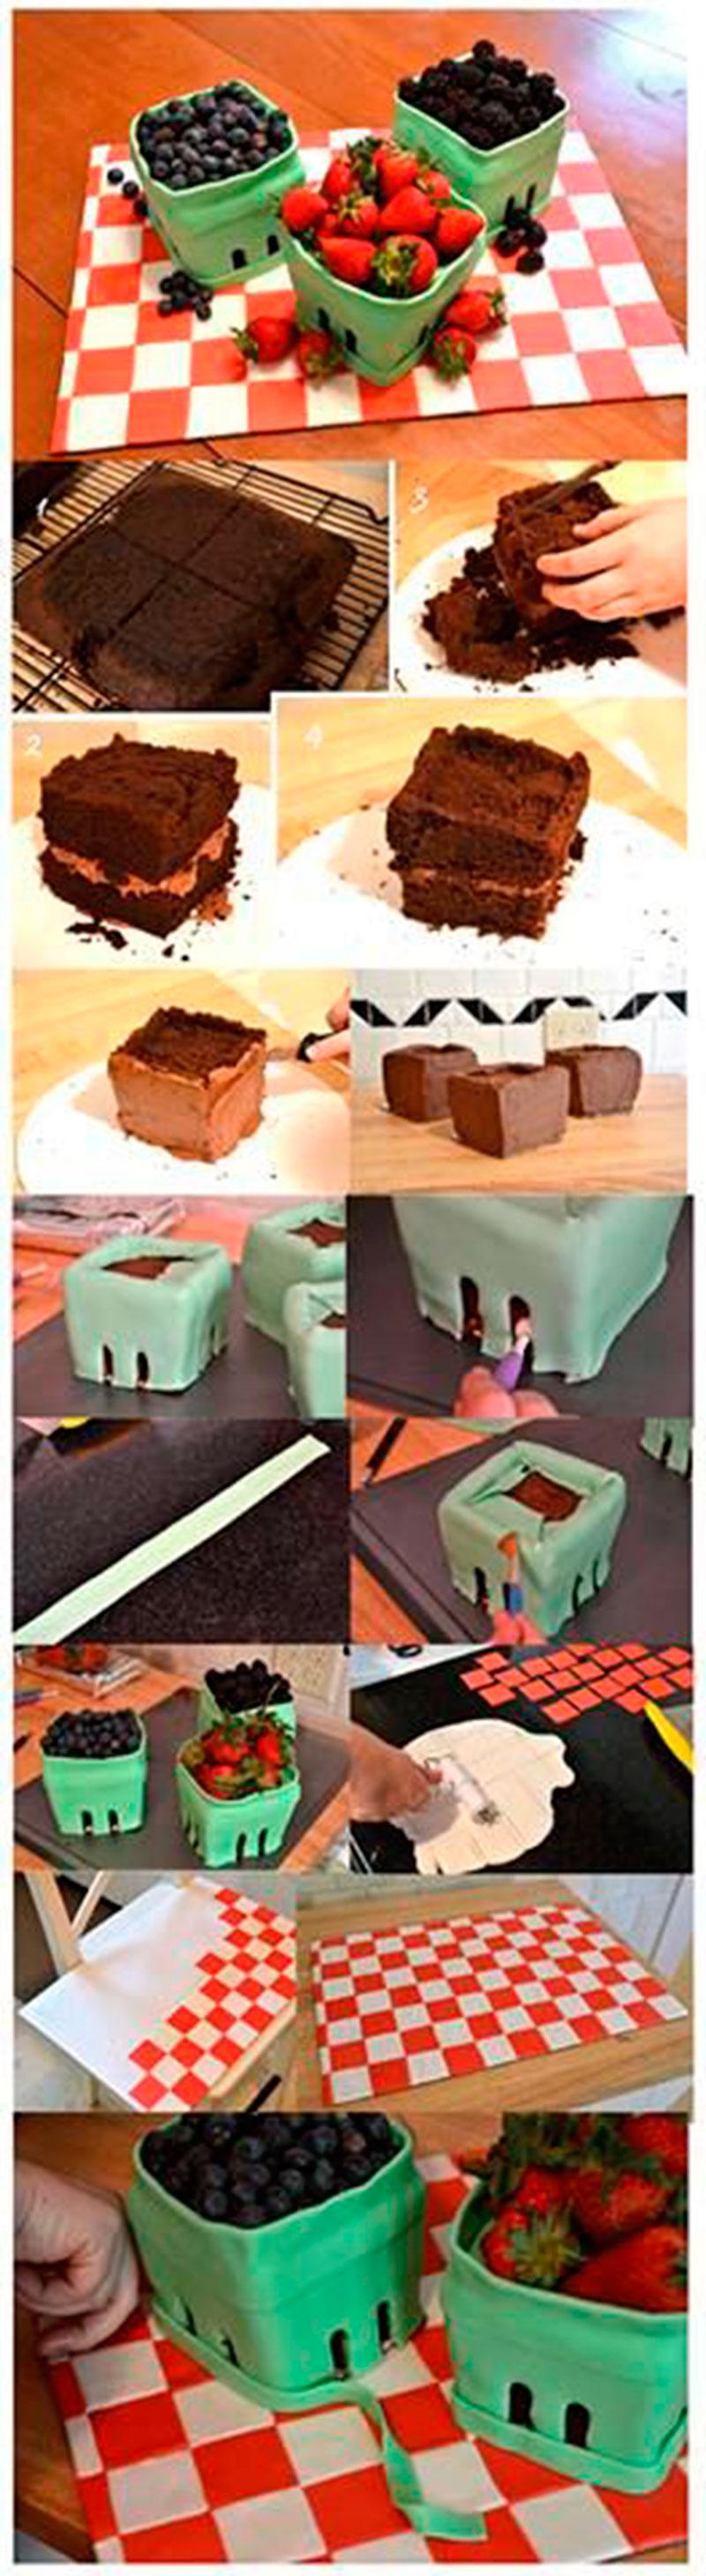 Montar bolo infantil 28